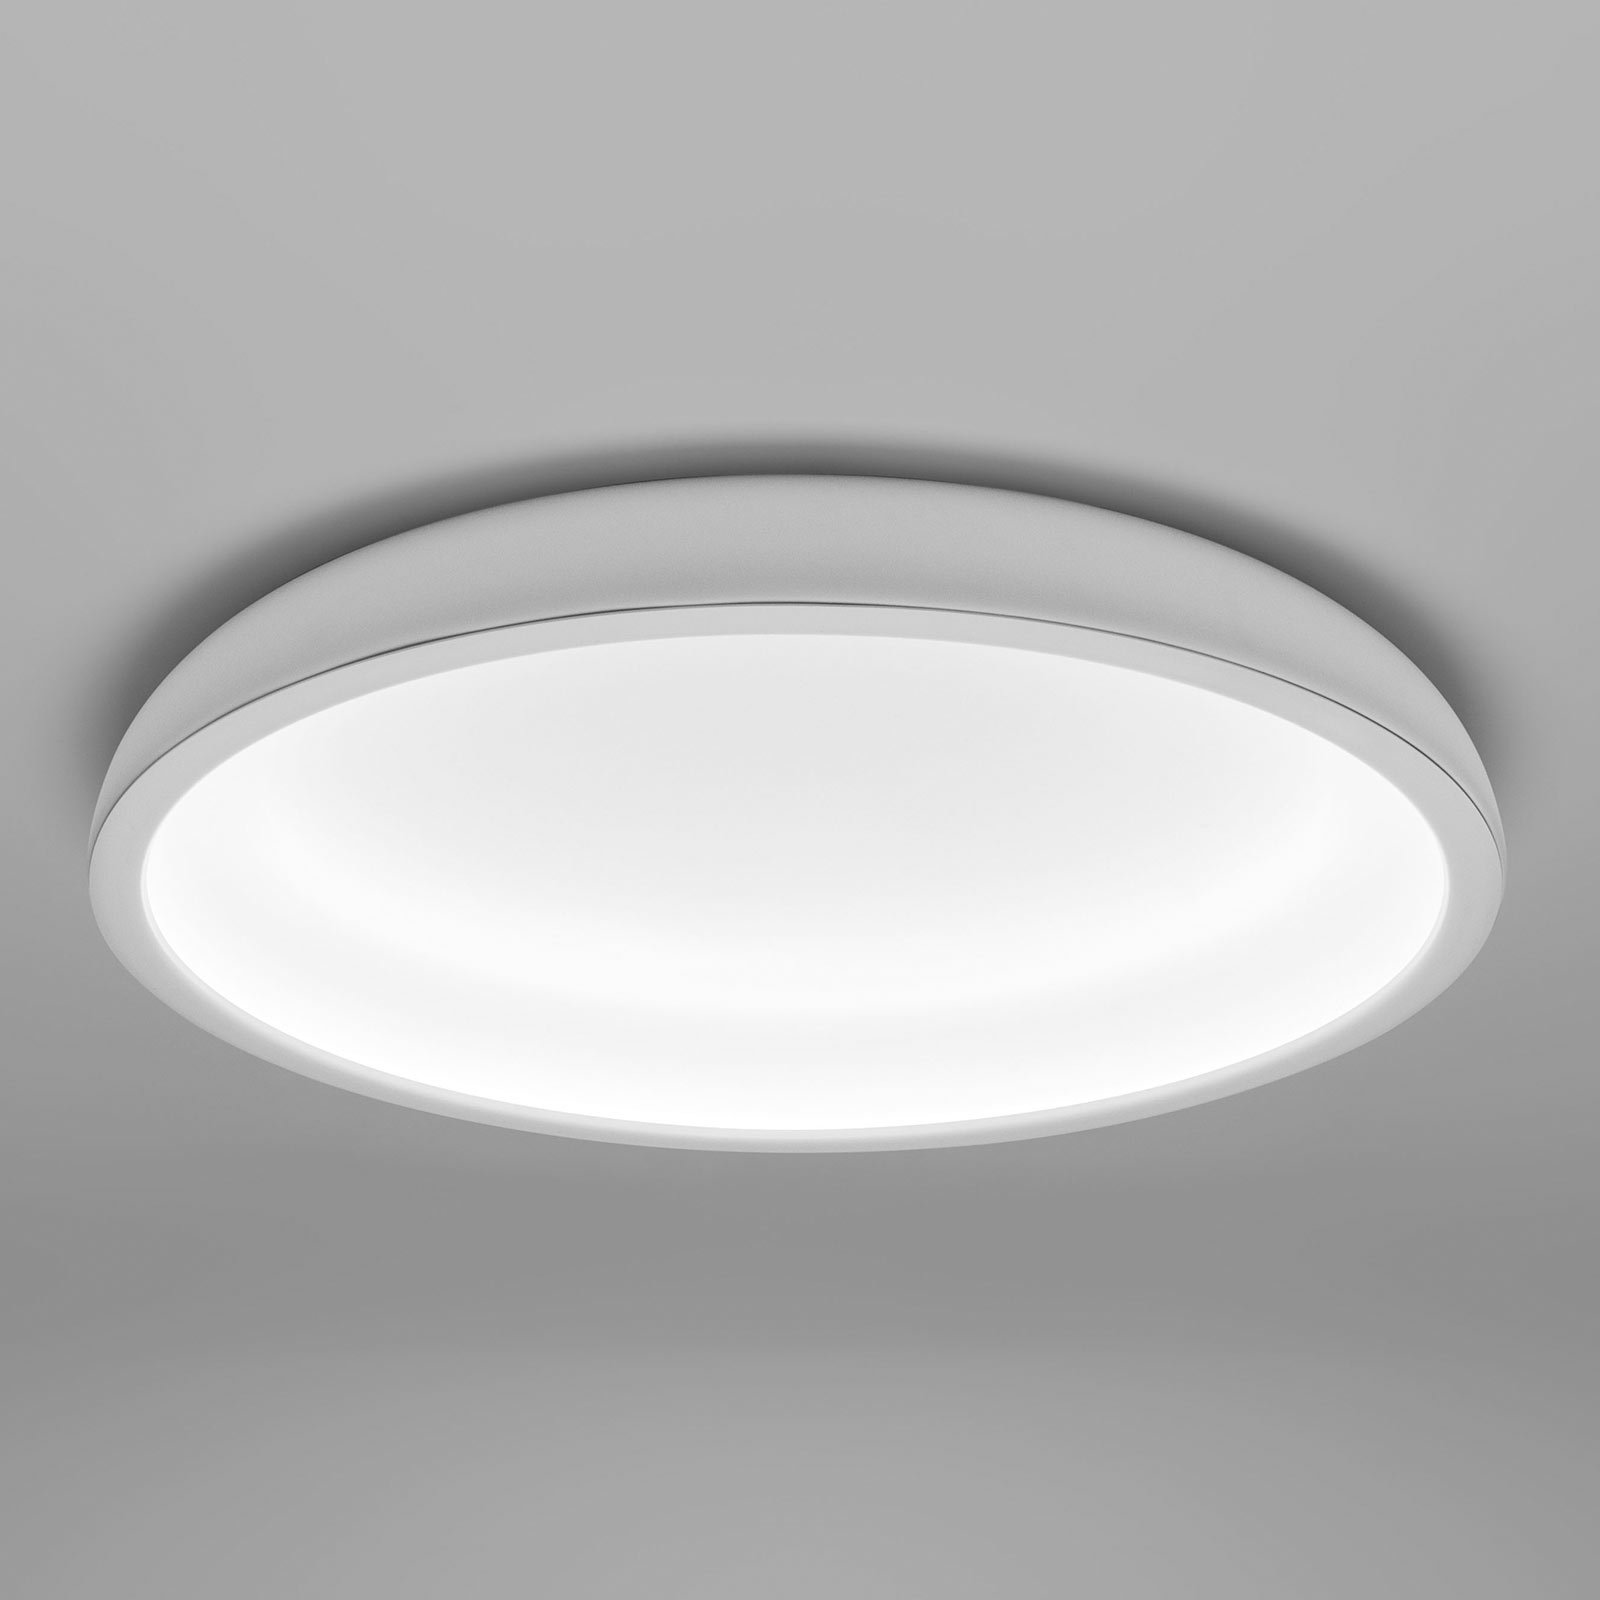 Reflexio LED-taklampe, Ø 46cm, hvit